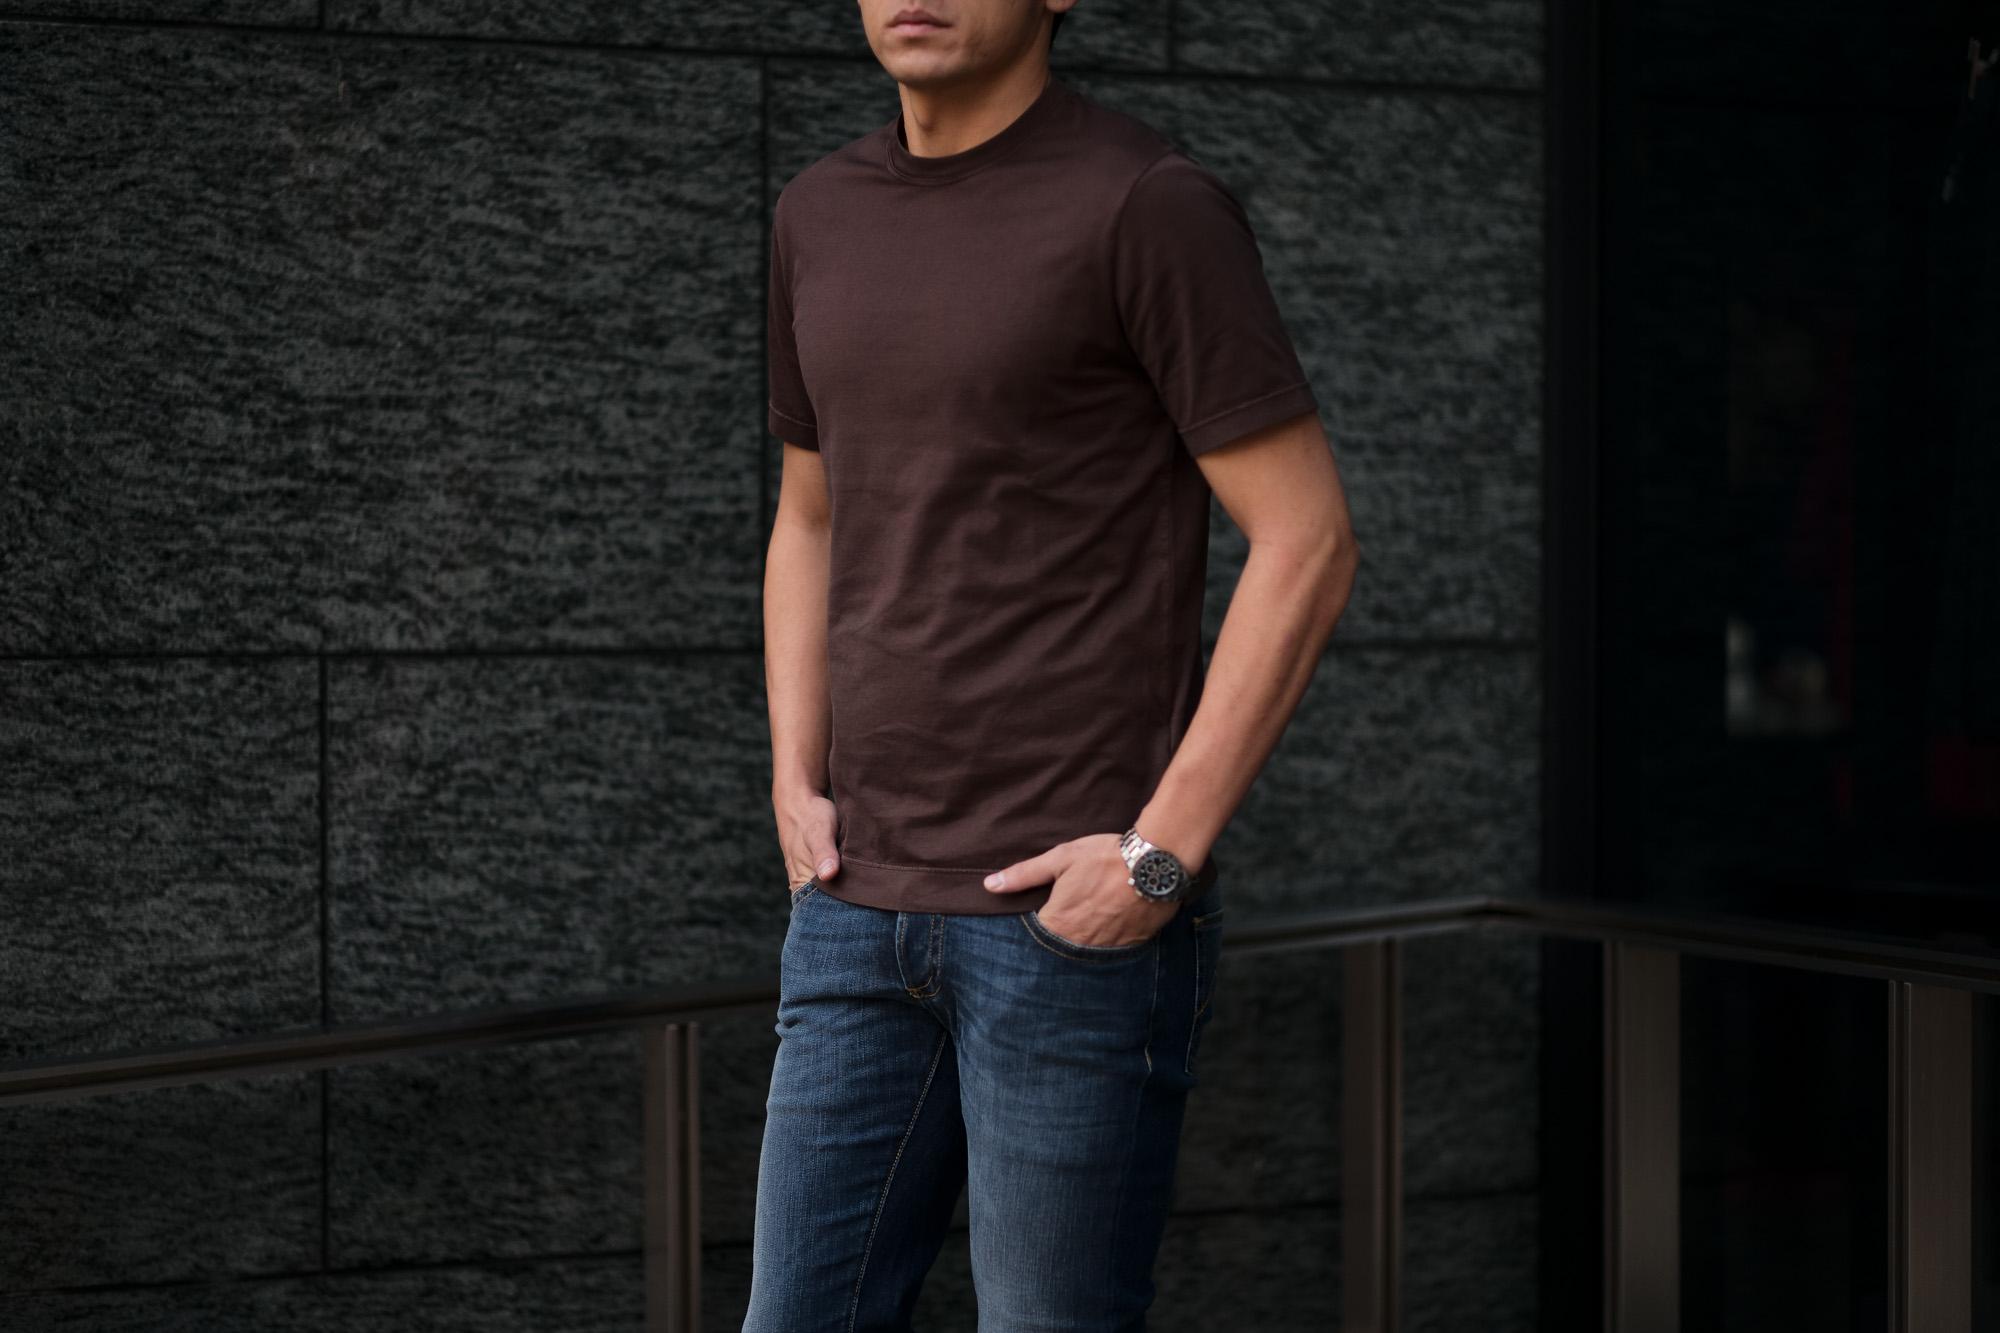 FEDELI(フェデーリ) Crew Neck T-shirt (クルーネック Tシャツ) ギザコットン Tシャツ BROWN (ブラウン・811) made in italy (イタリア製) 2020 春夏 【ご予約受付中】 愛知 名古屋 altoediritto アルトエデリット TEE